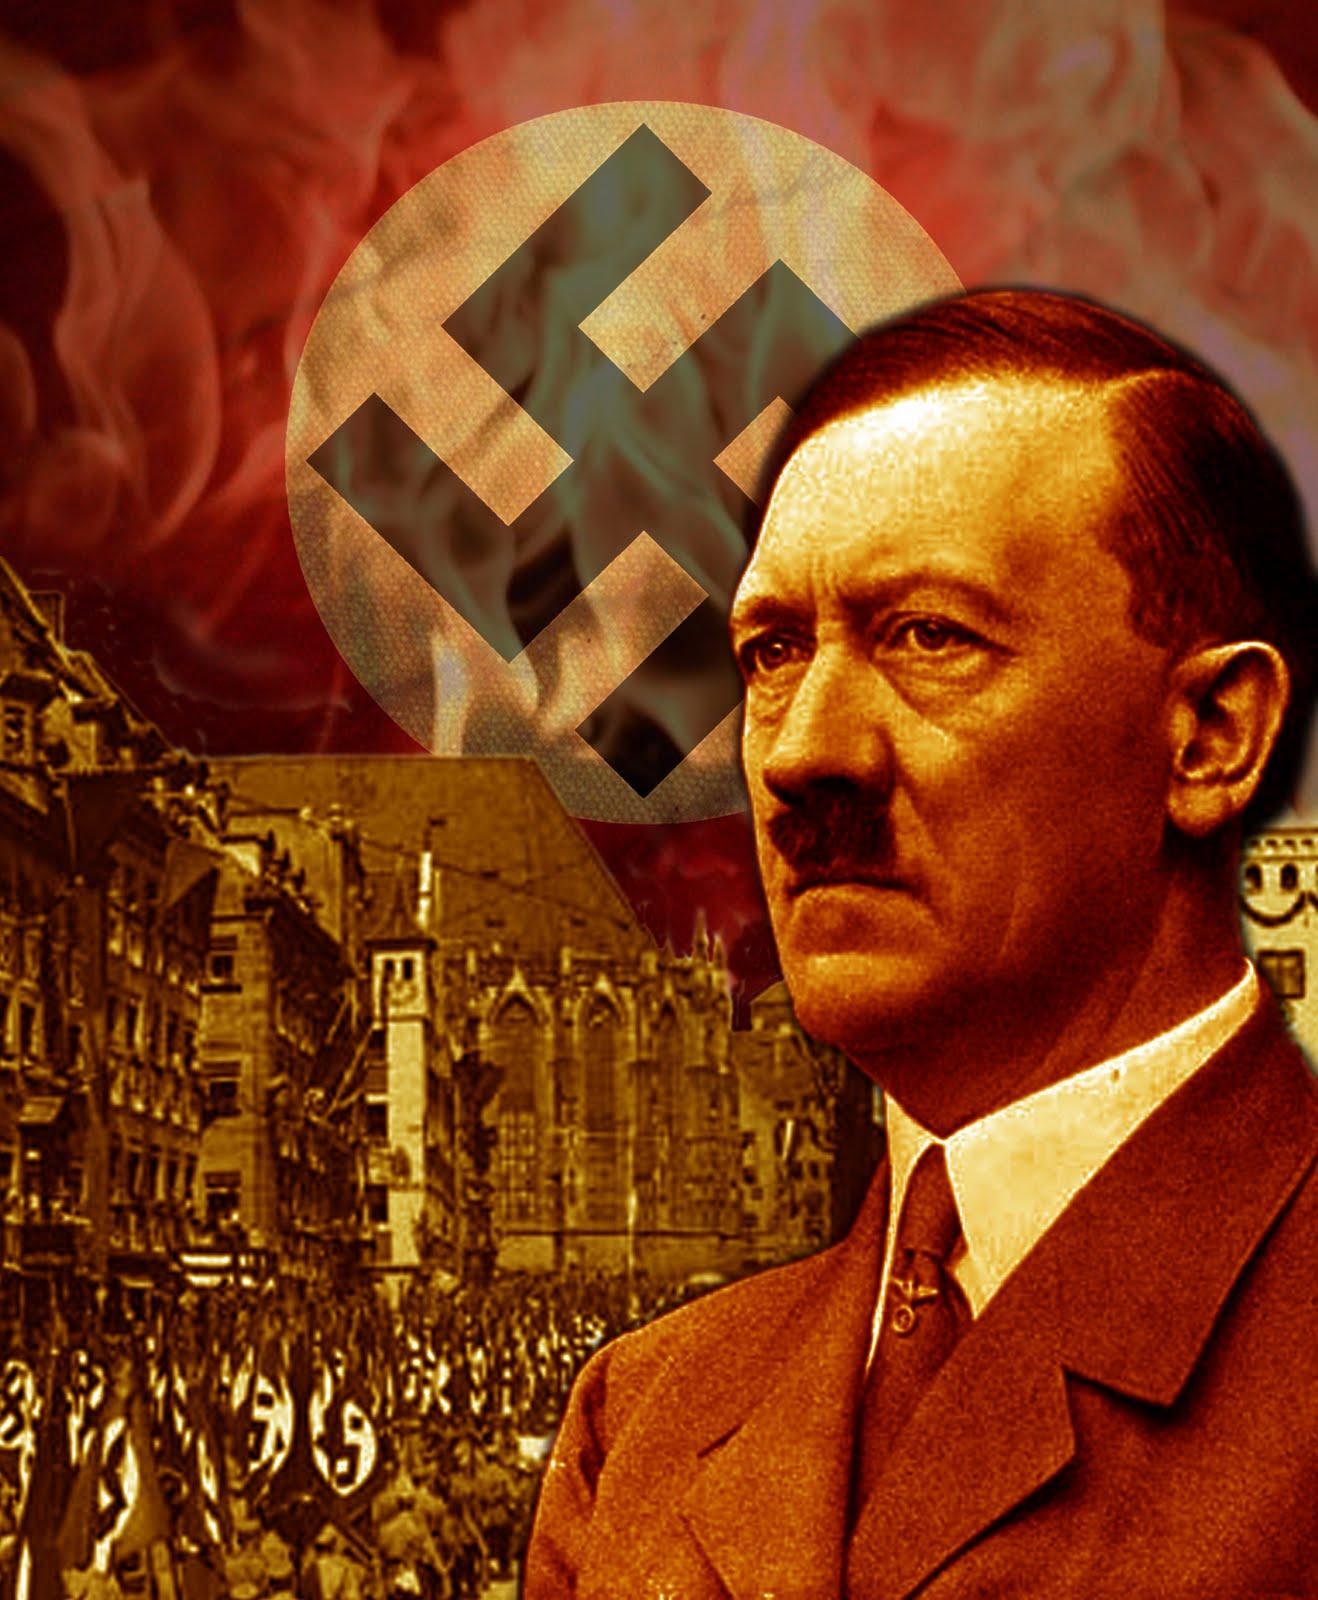 http://2.bp.blogspot.com/-WmyWdpKxBWA/Tt5Y8lGvuxI/AAAAAAAADL4/xtOm9OsgyGY/s1600/Hitler.jpg